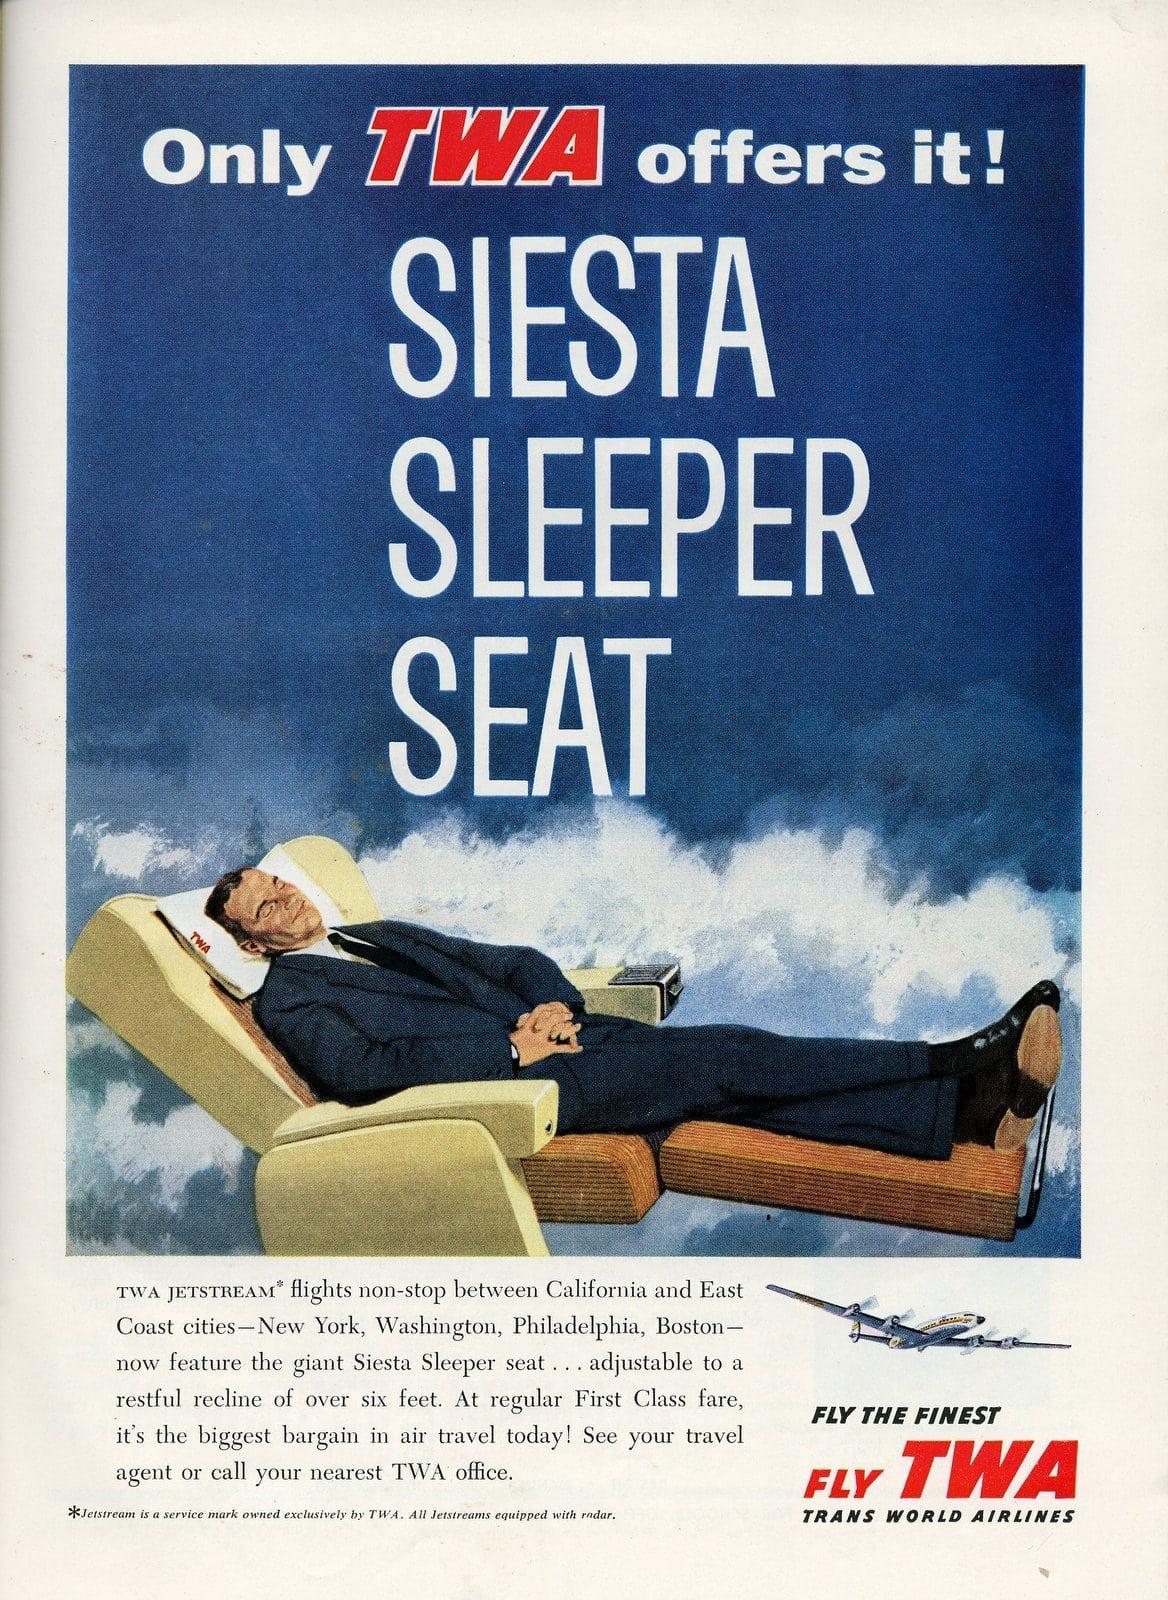 TWA airlines siesta sleeper seat (1958)